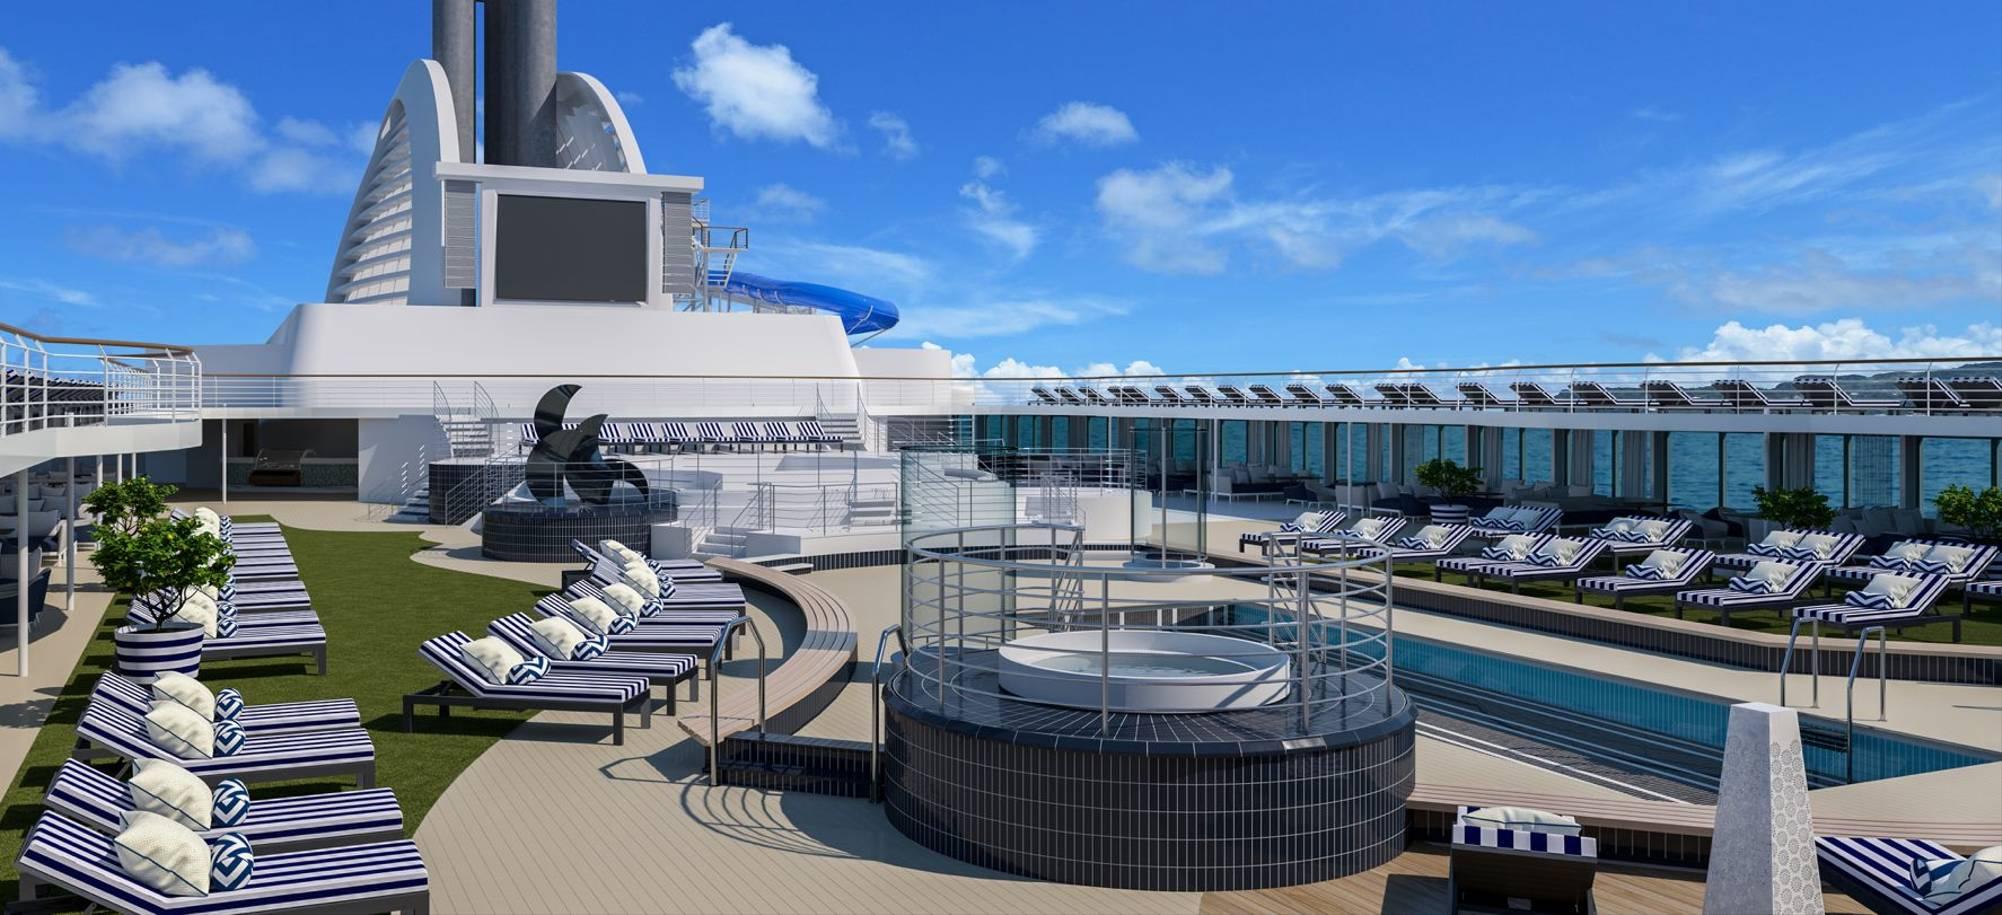 Explorer At Sea   Main Deck With Big Screen   Itinerary Desktop